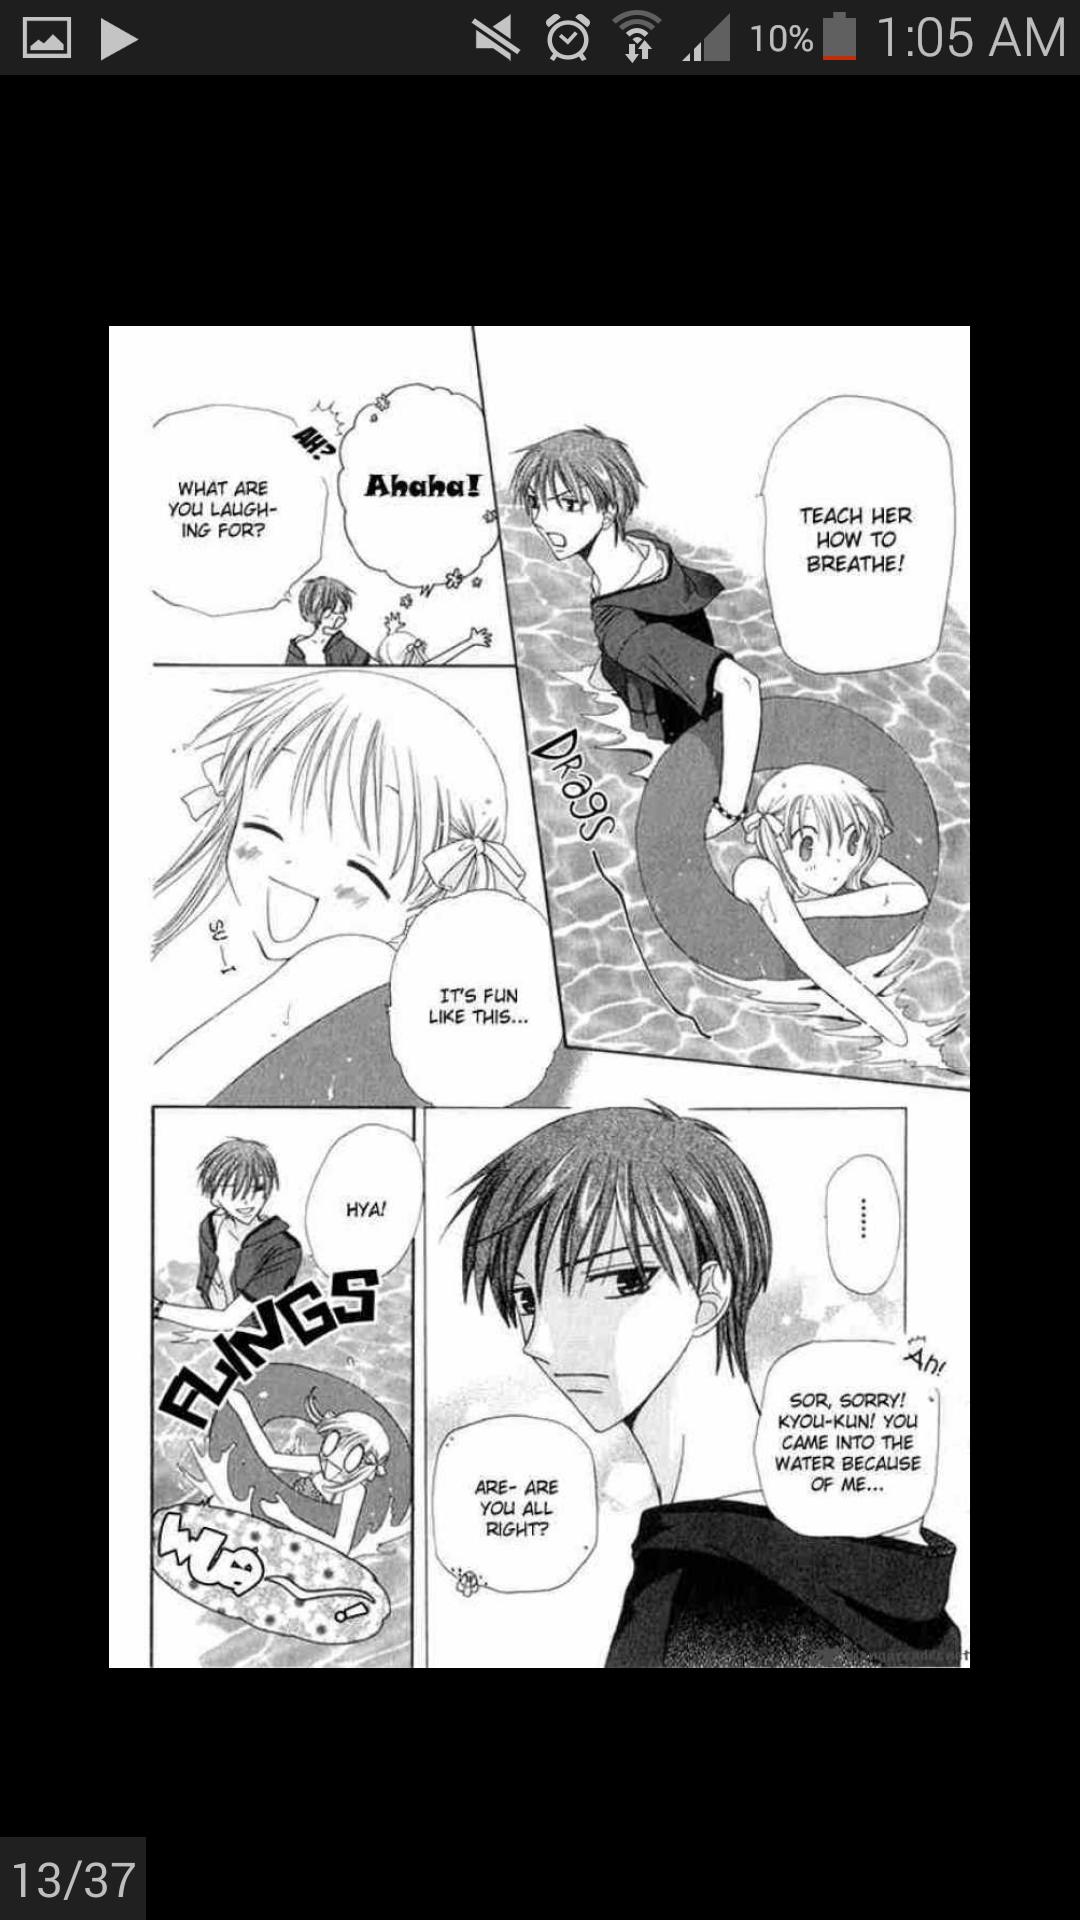 Pin by anime anime manga manga on Fruit Basket Anime